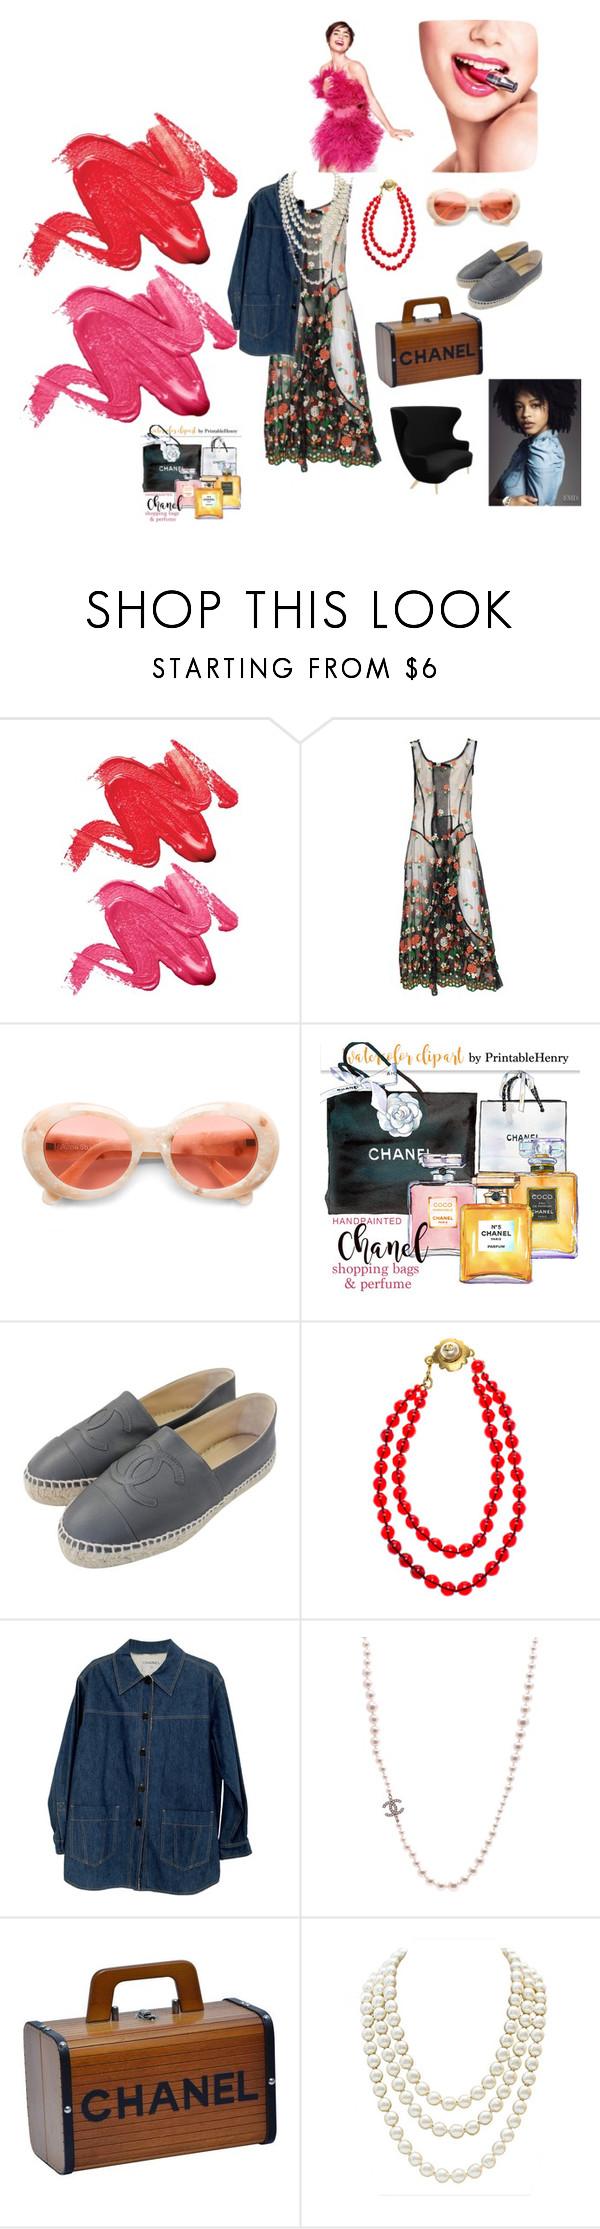 """Easy To Use..."" by rosastreet on Polyvore featuring moda, Stila, Lancôme, Comme des Garçons, Acne Studios, Chanel e Tom Dixon"